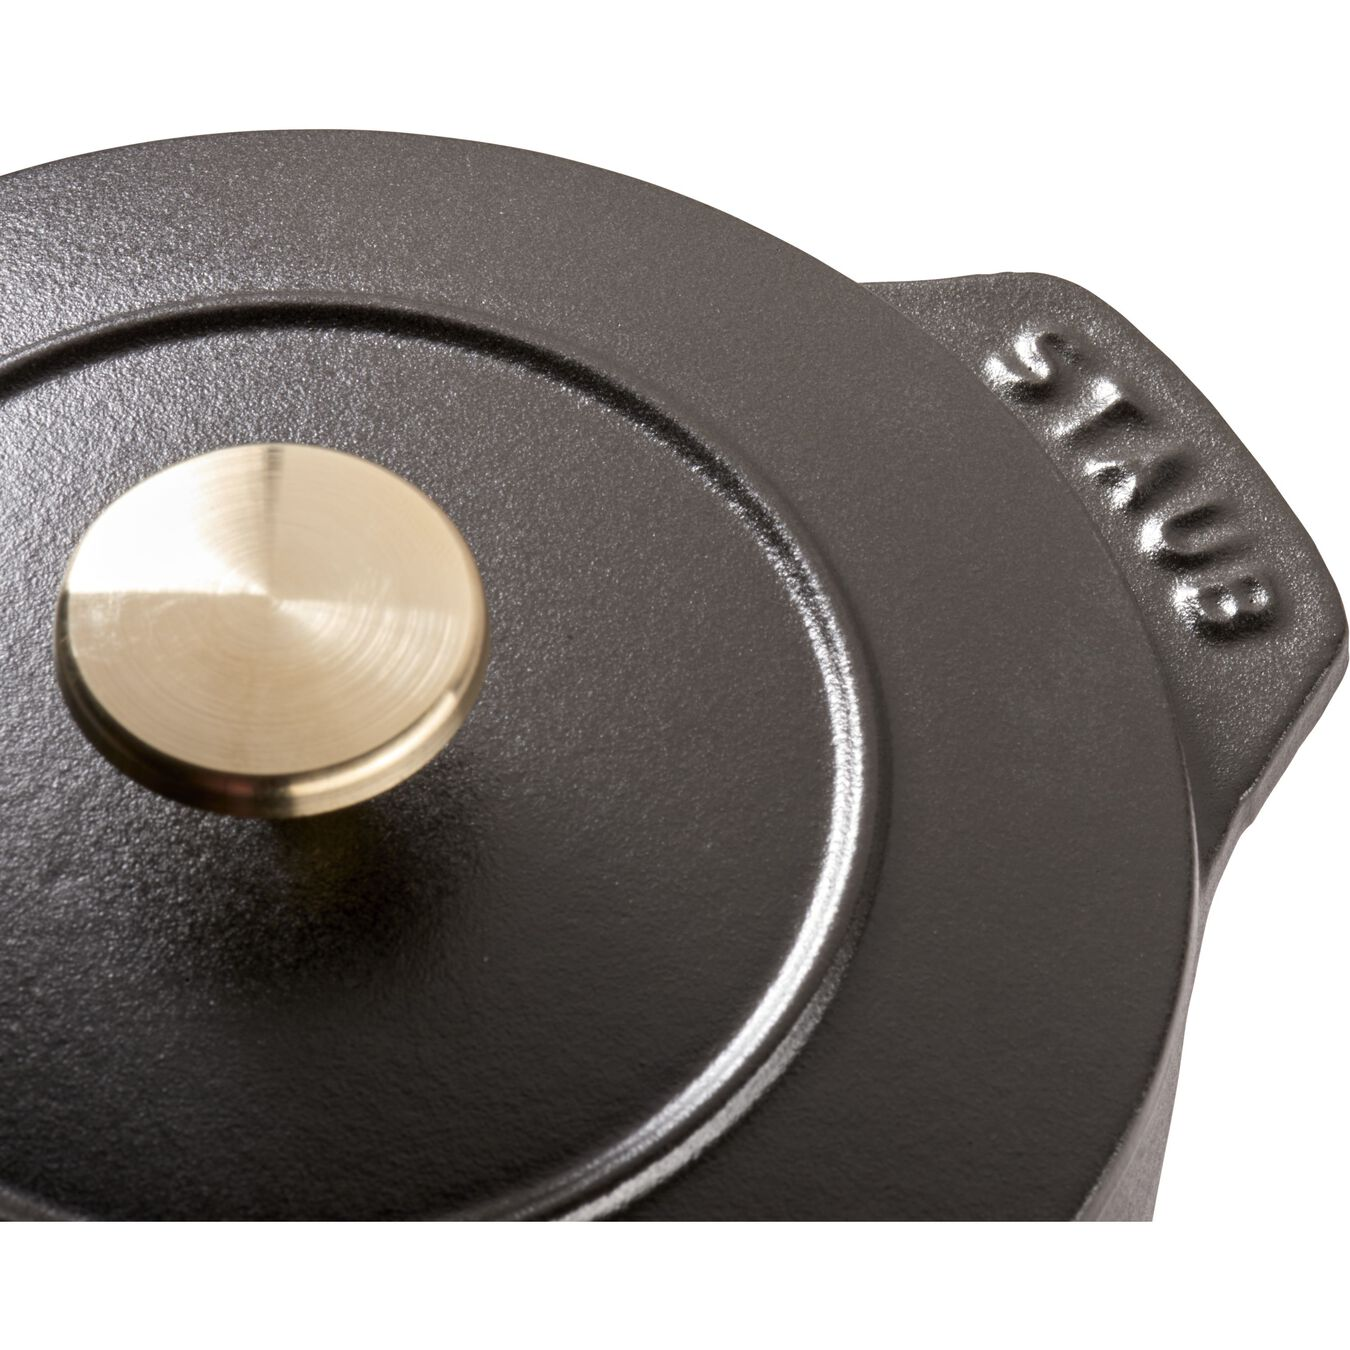 0.775 qt, Petite French Oven, black matte,,large 3